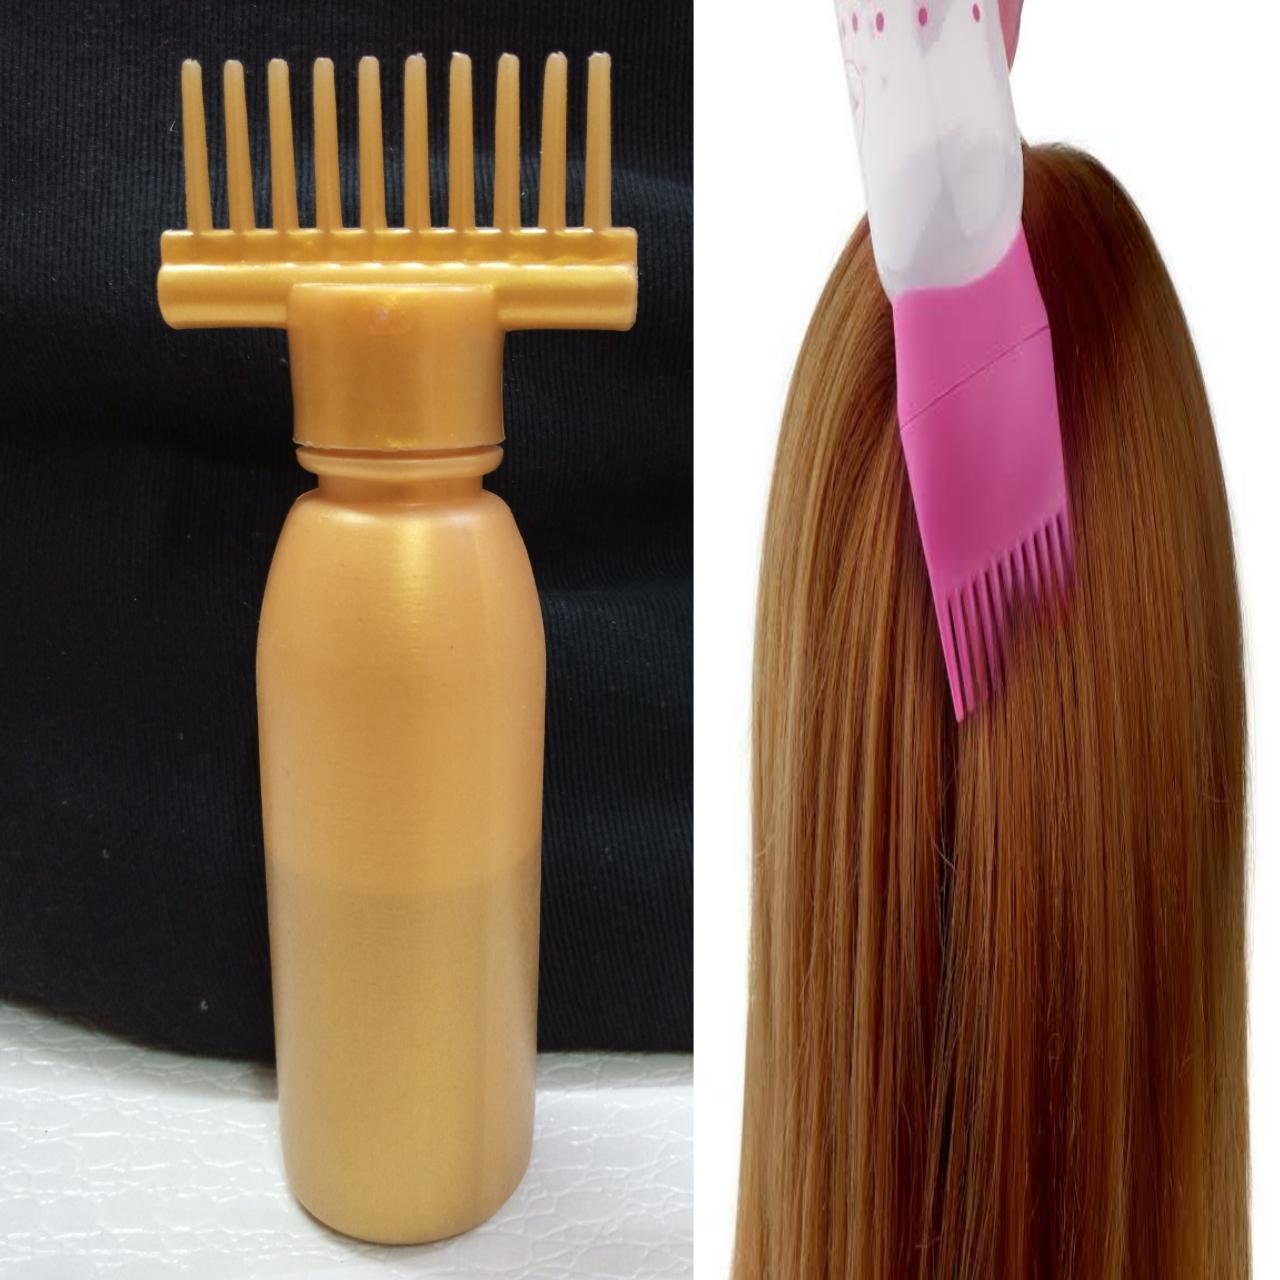 180ML Plastic Dyeing Shampoo Bottle Oil Comb Hair Tools Hair Dye Applicator Brush Bottles Styling Tool Hair Coloring use for multipurpose(1doller shop)